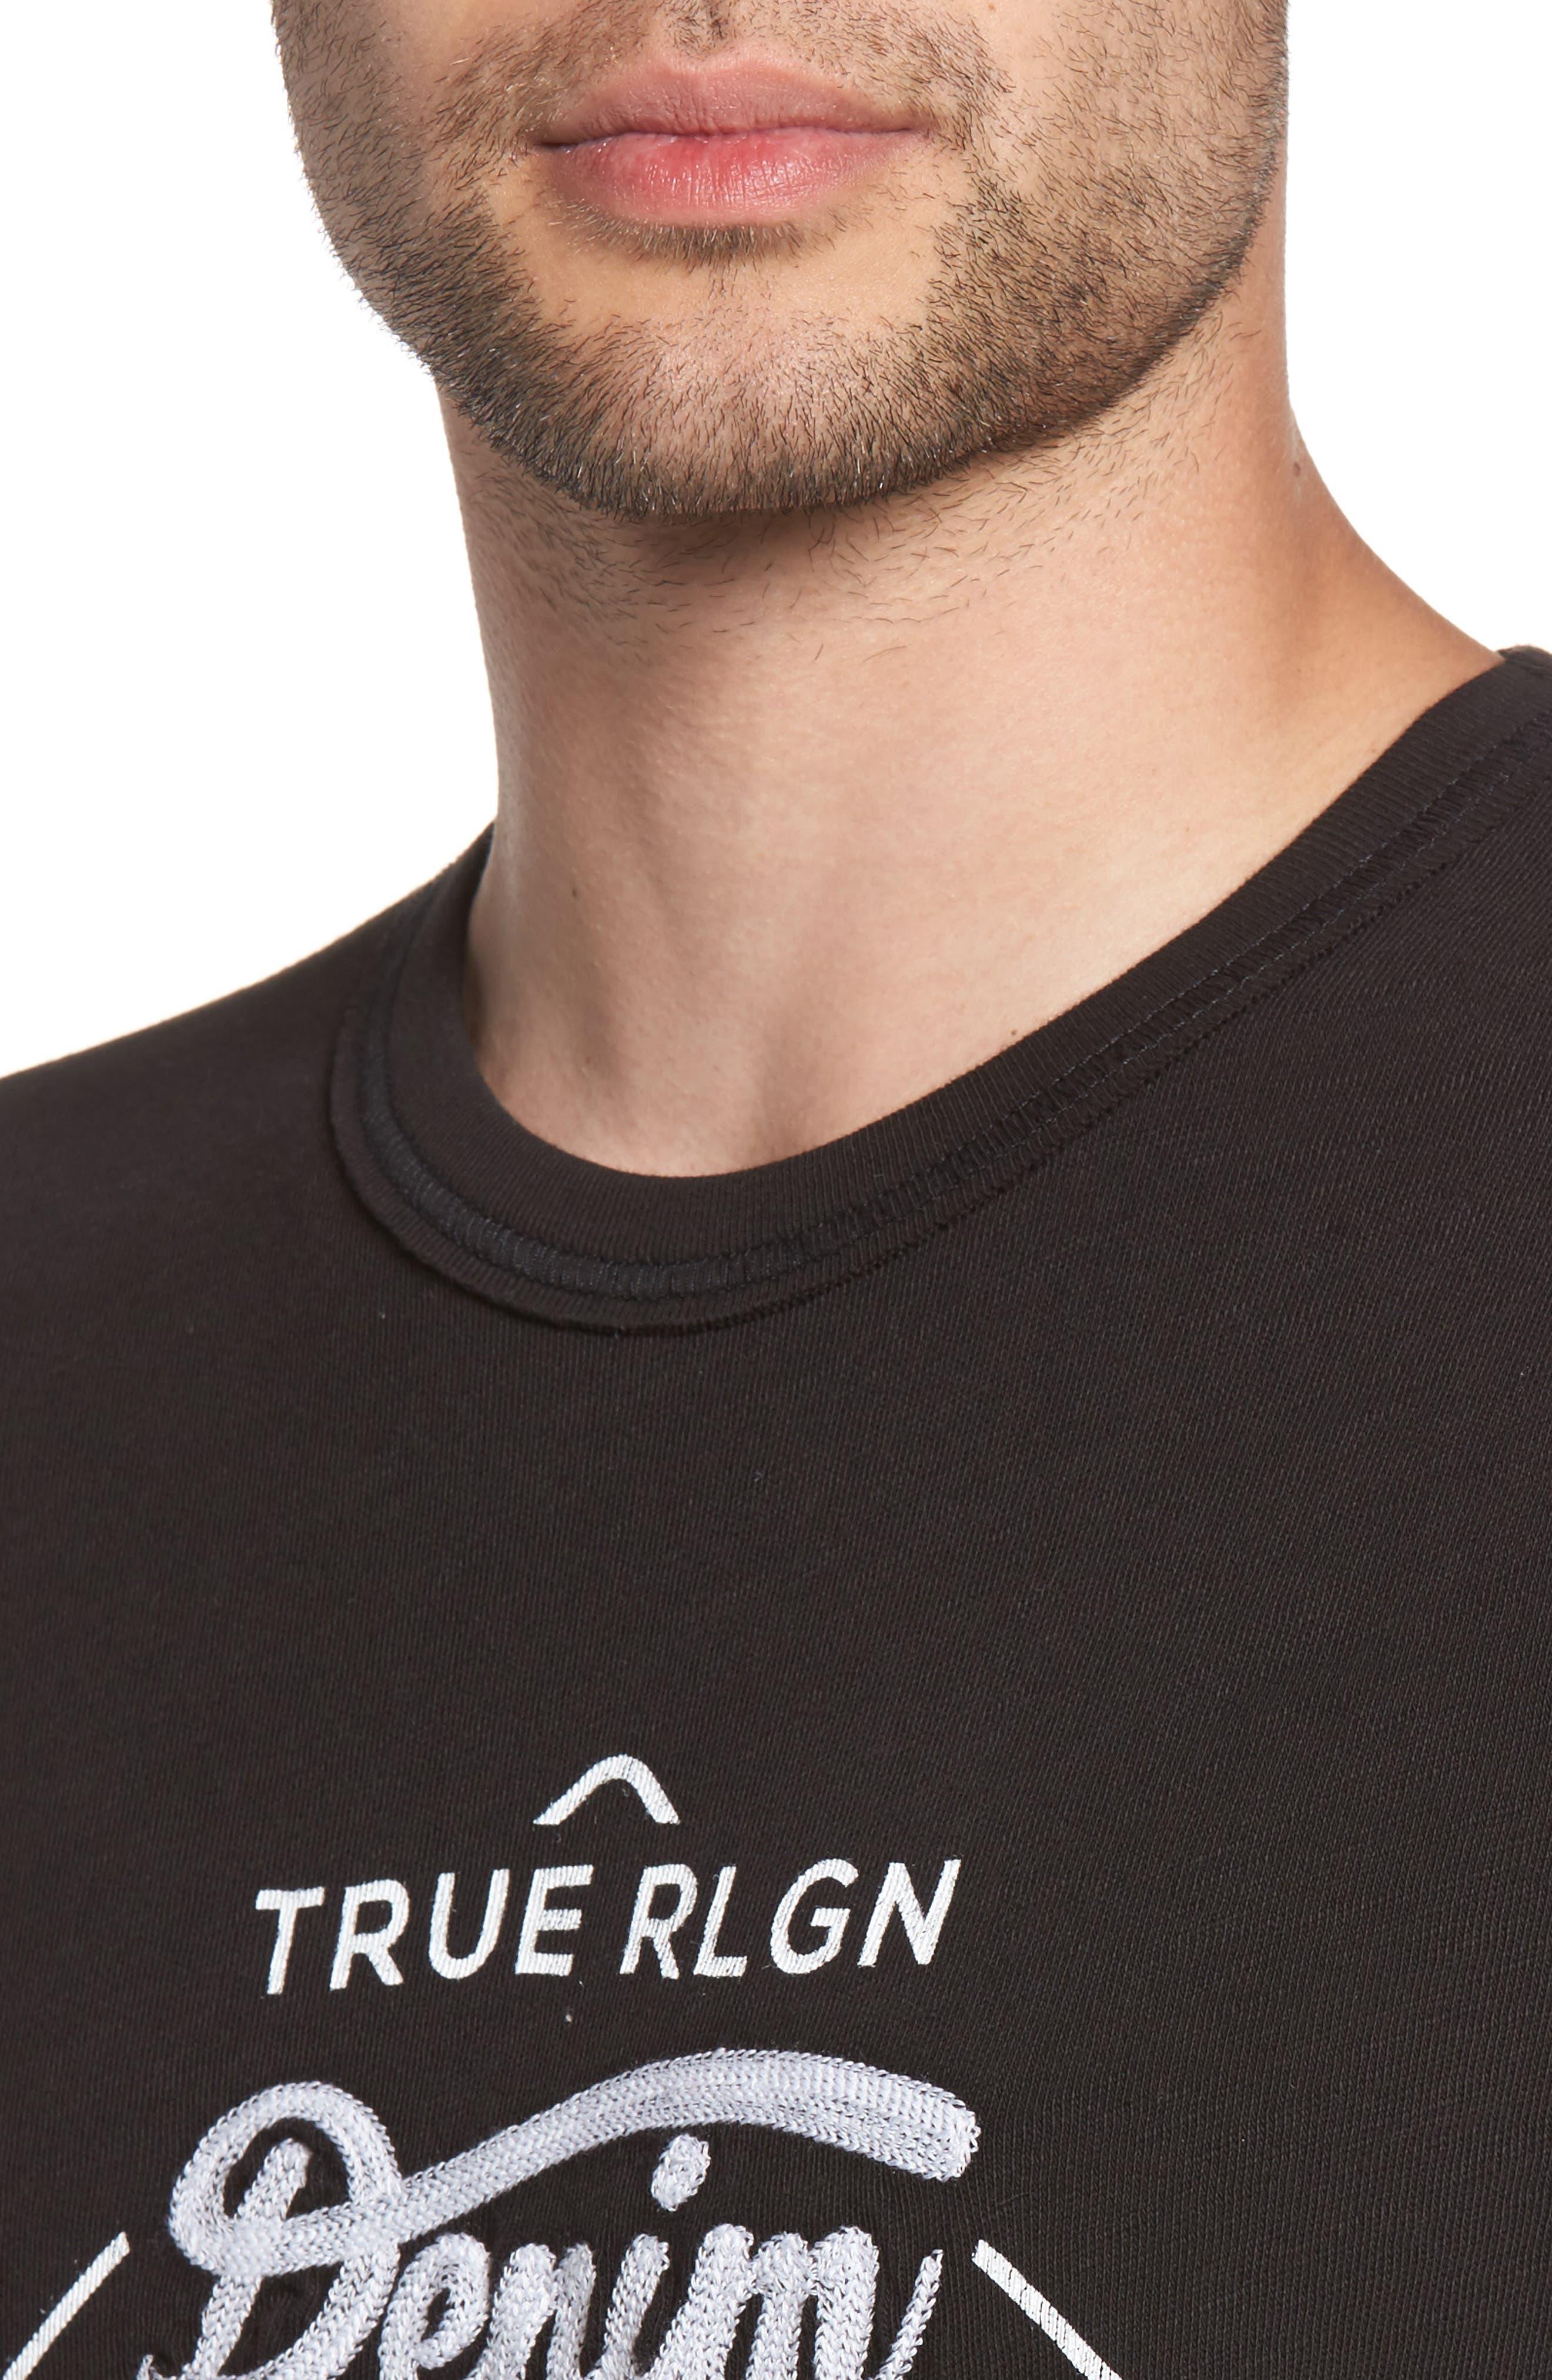 Denim Goods T-Shirt,                             Alternate thumbnail 4, color,                             Black